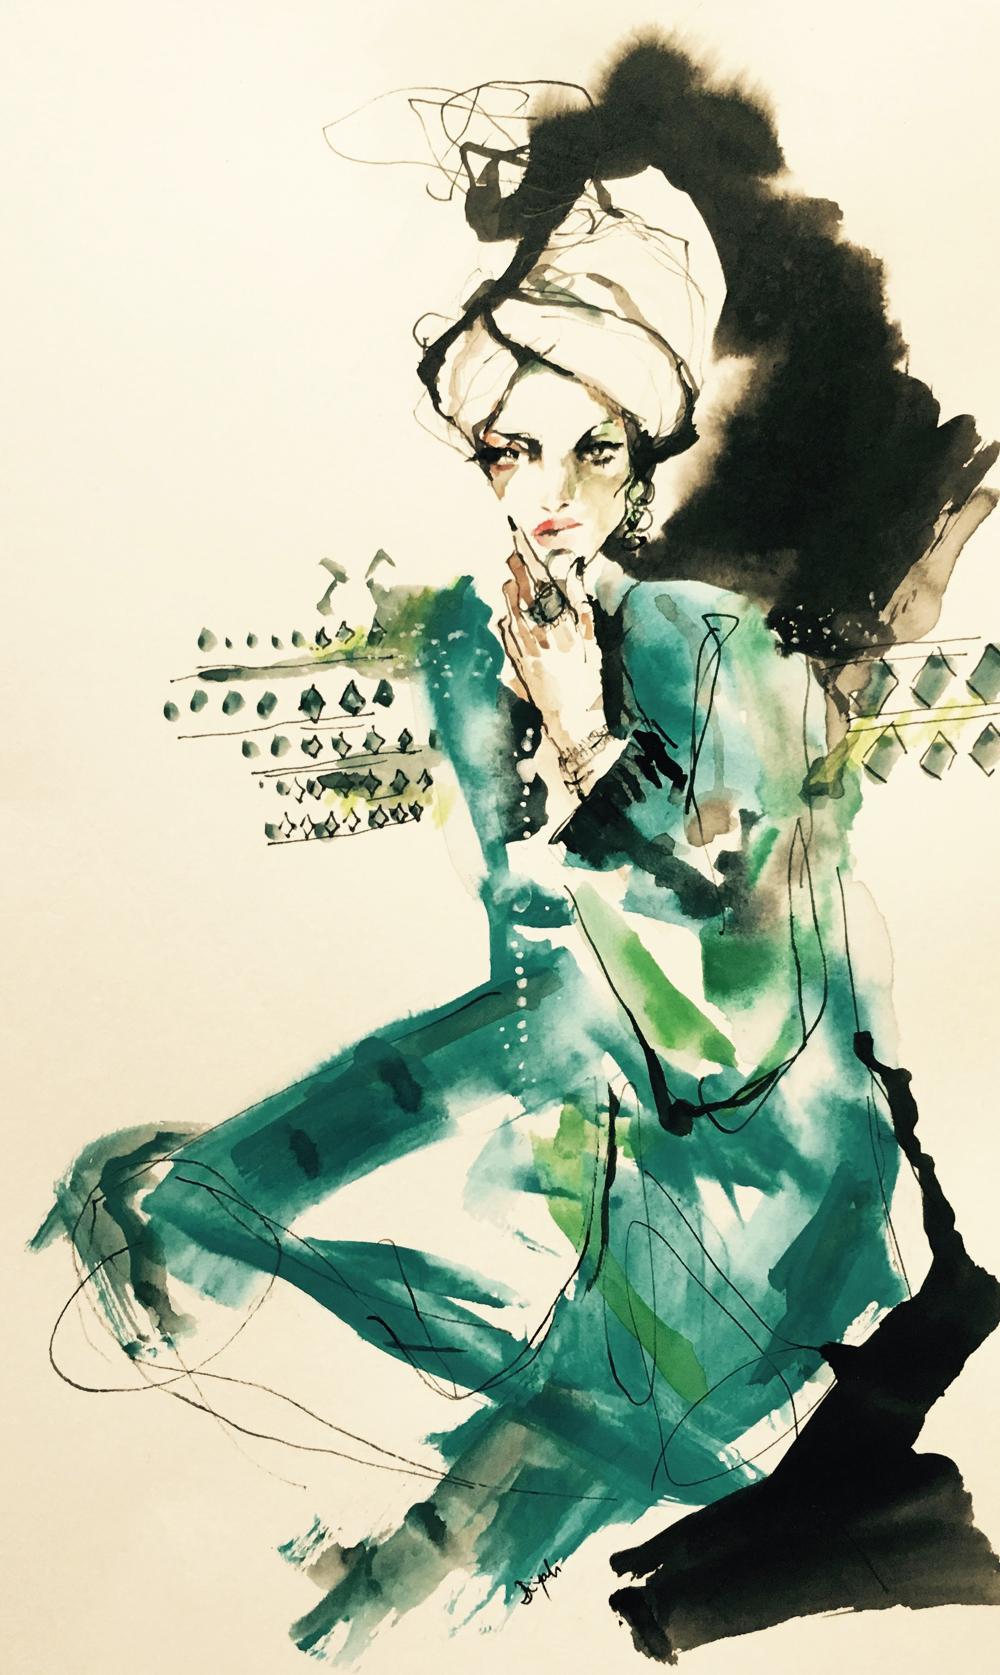 Vogue Arabia: How the Kaftan Went Global